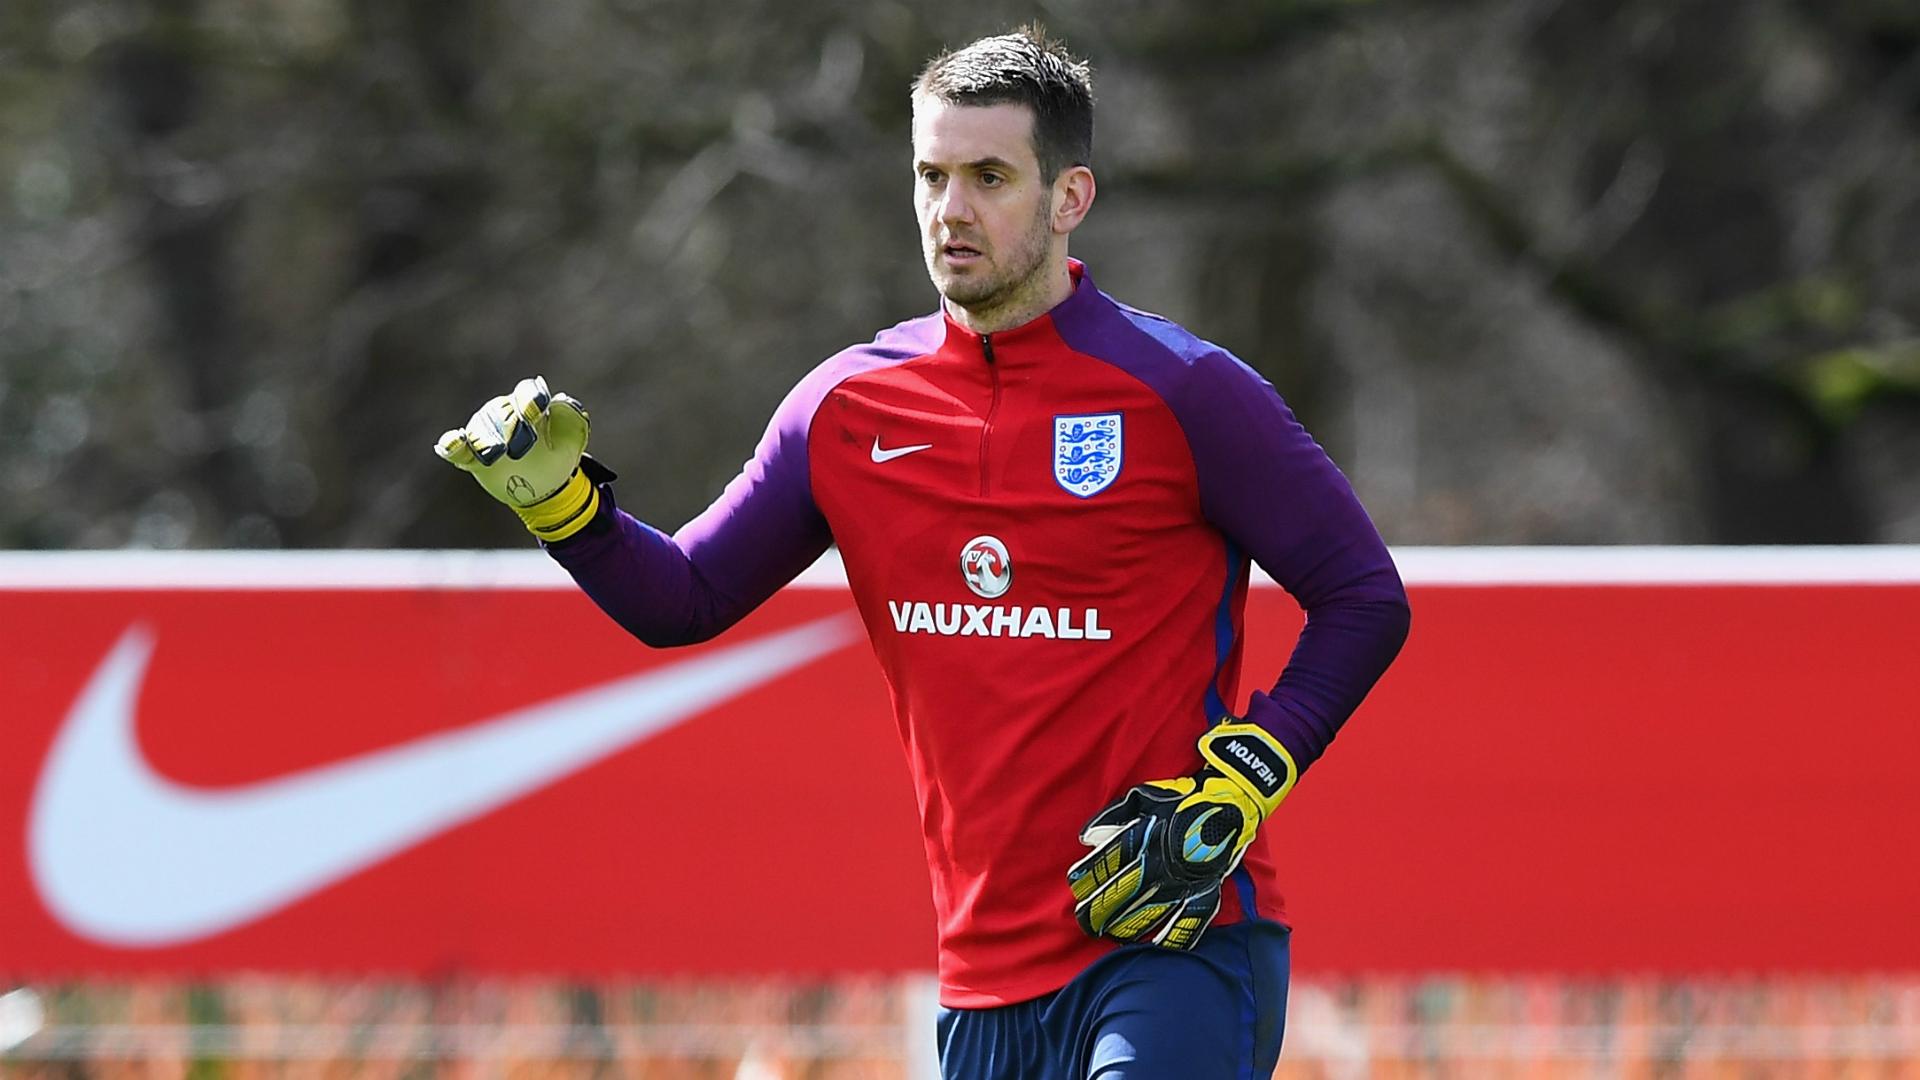 England's Euro 2016 squad | Tom Heaton